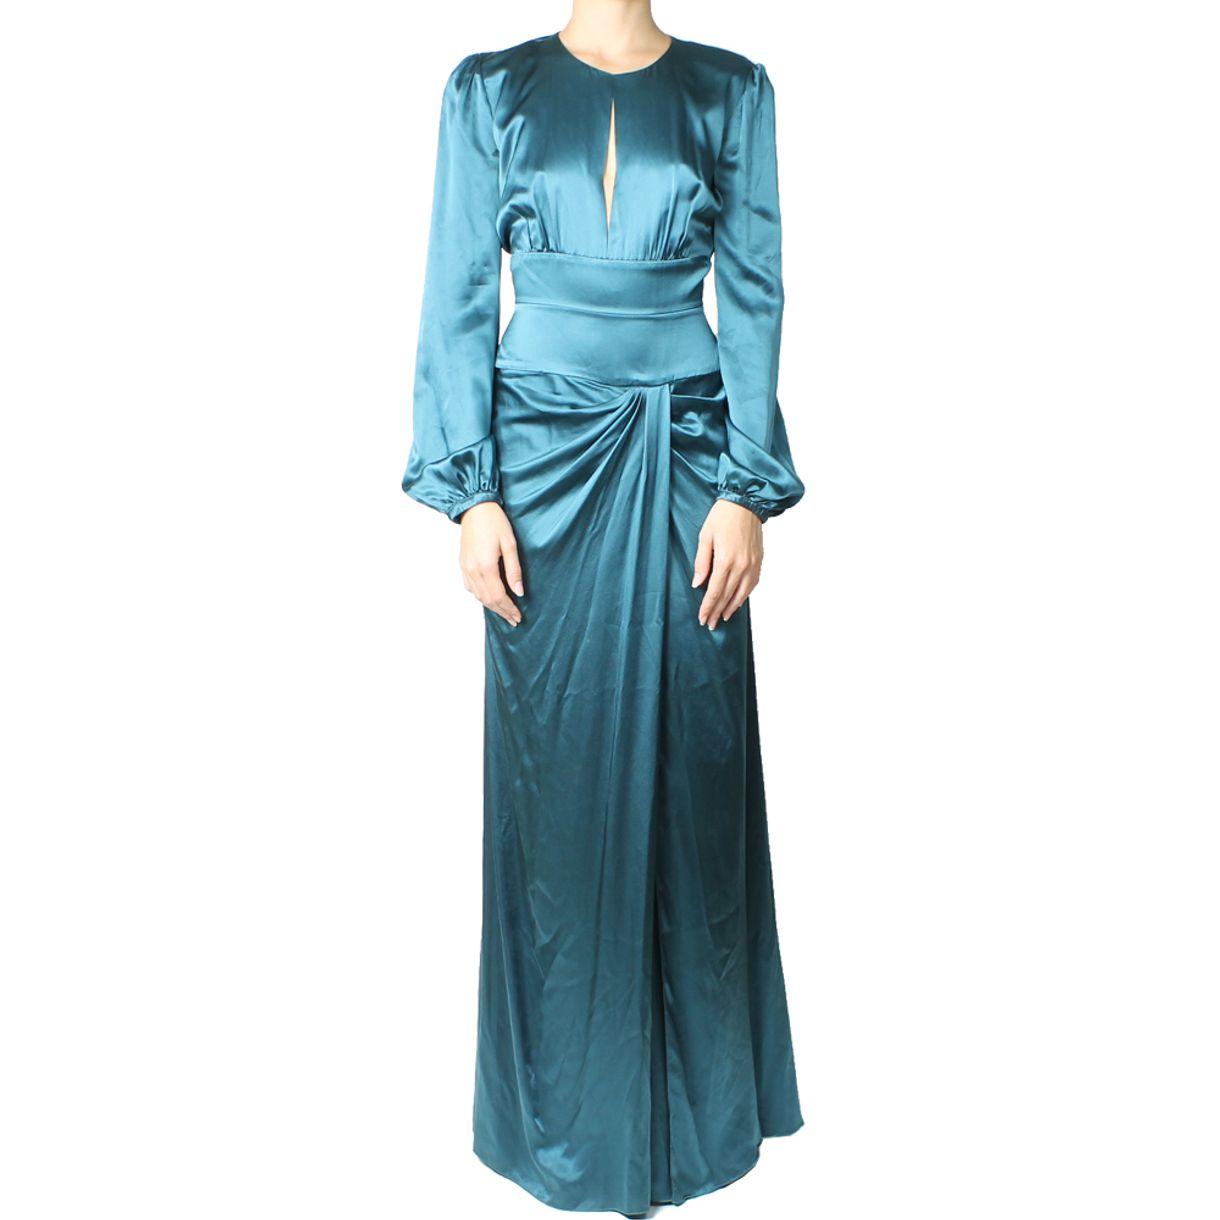 vestido-rboerto-cavalli-azul-petroleo-1